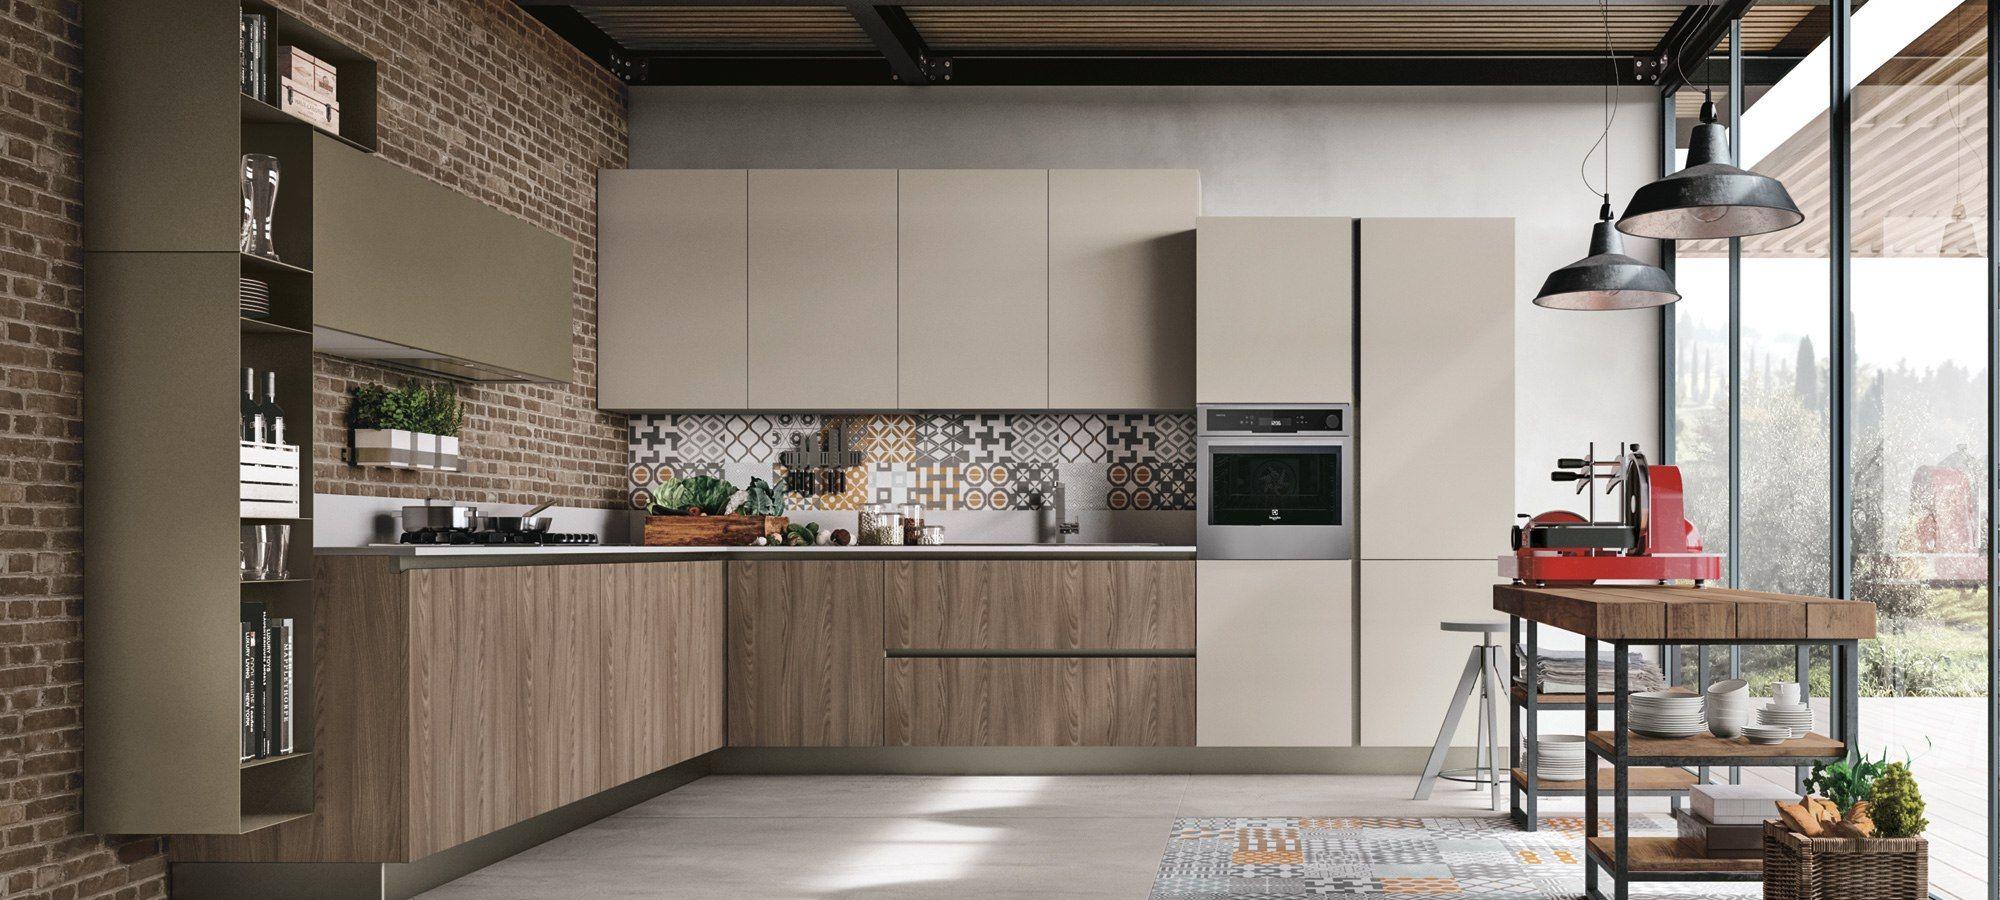 cucine moderne stosa - modello cucina infinity 13 | Kitchen nel 2019 ...